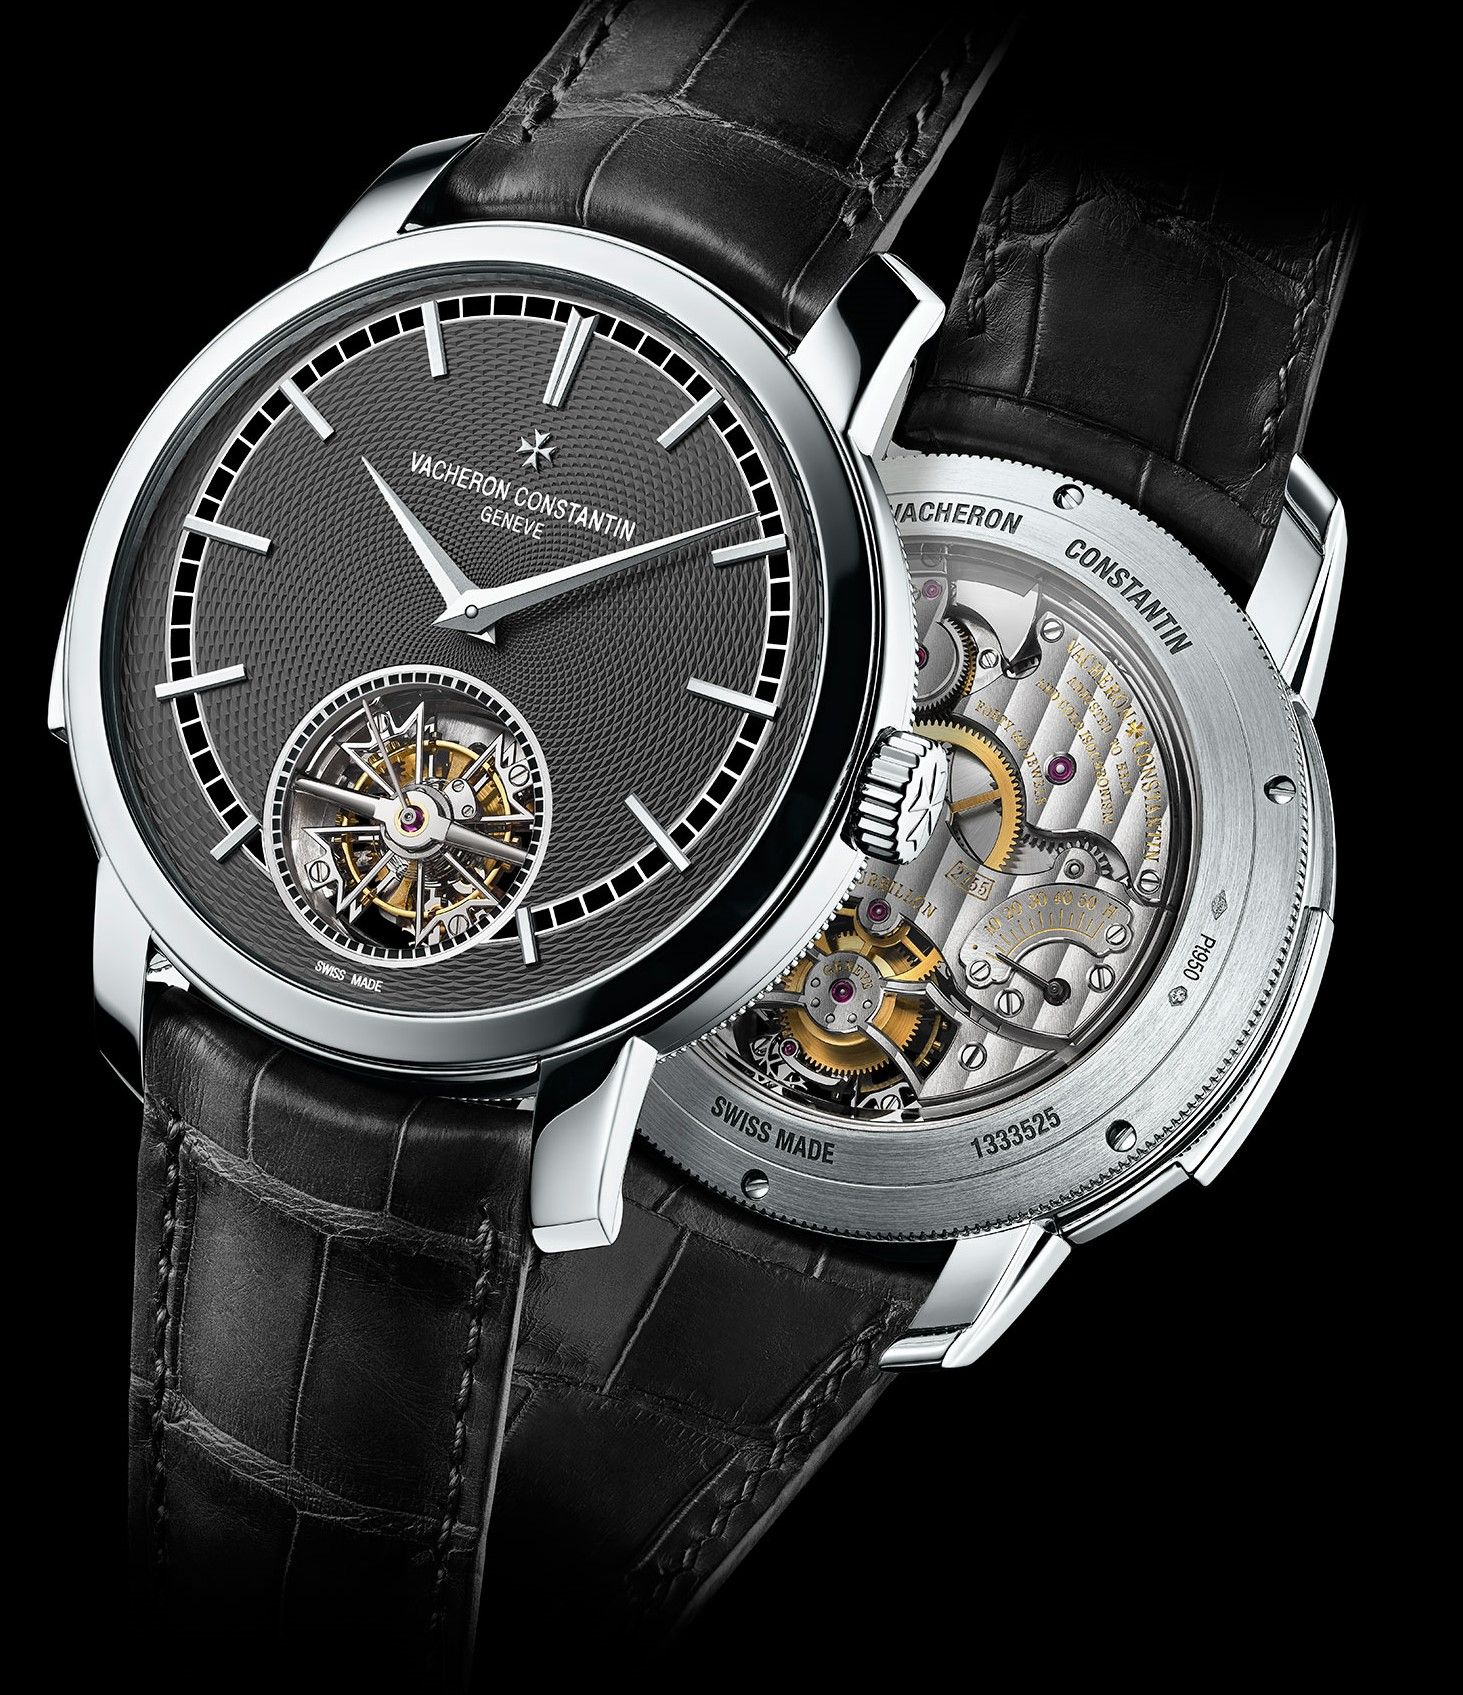 Vacheron Constantin Traditionnelle Minute Repeater Tourbillon Watch Platinum Case Perpetuelle Timepieces Tourbillon Watch Luxury Watches For Men Luxury Watches